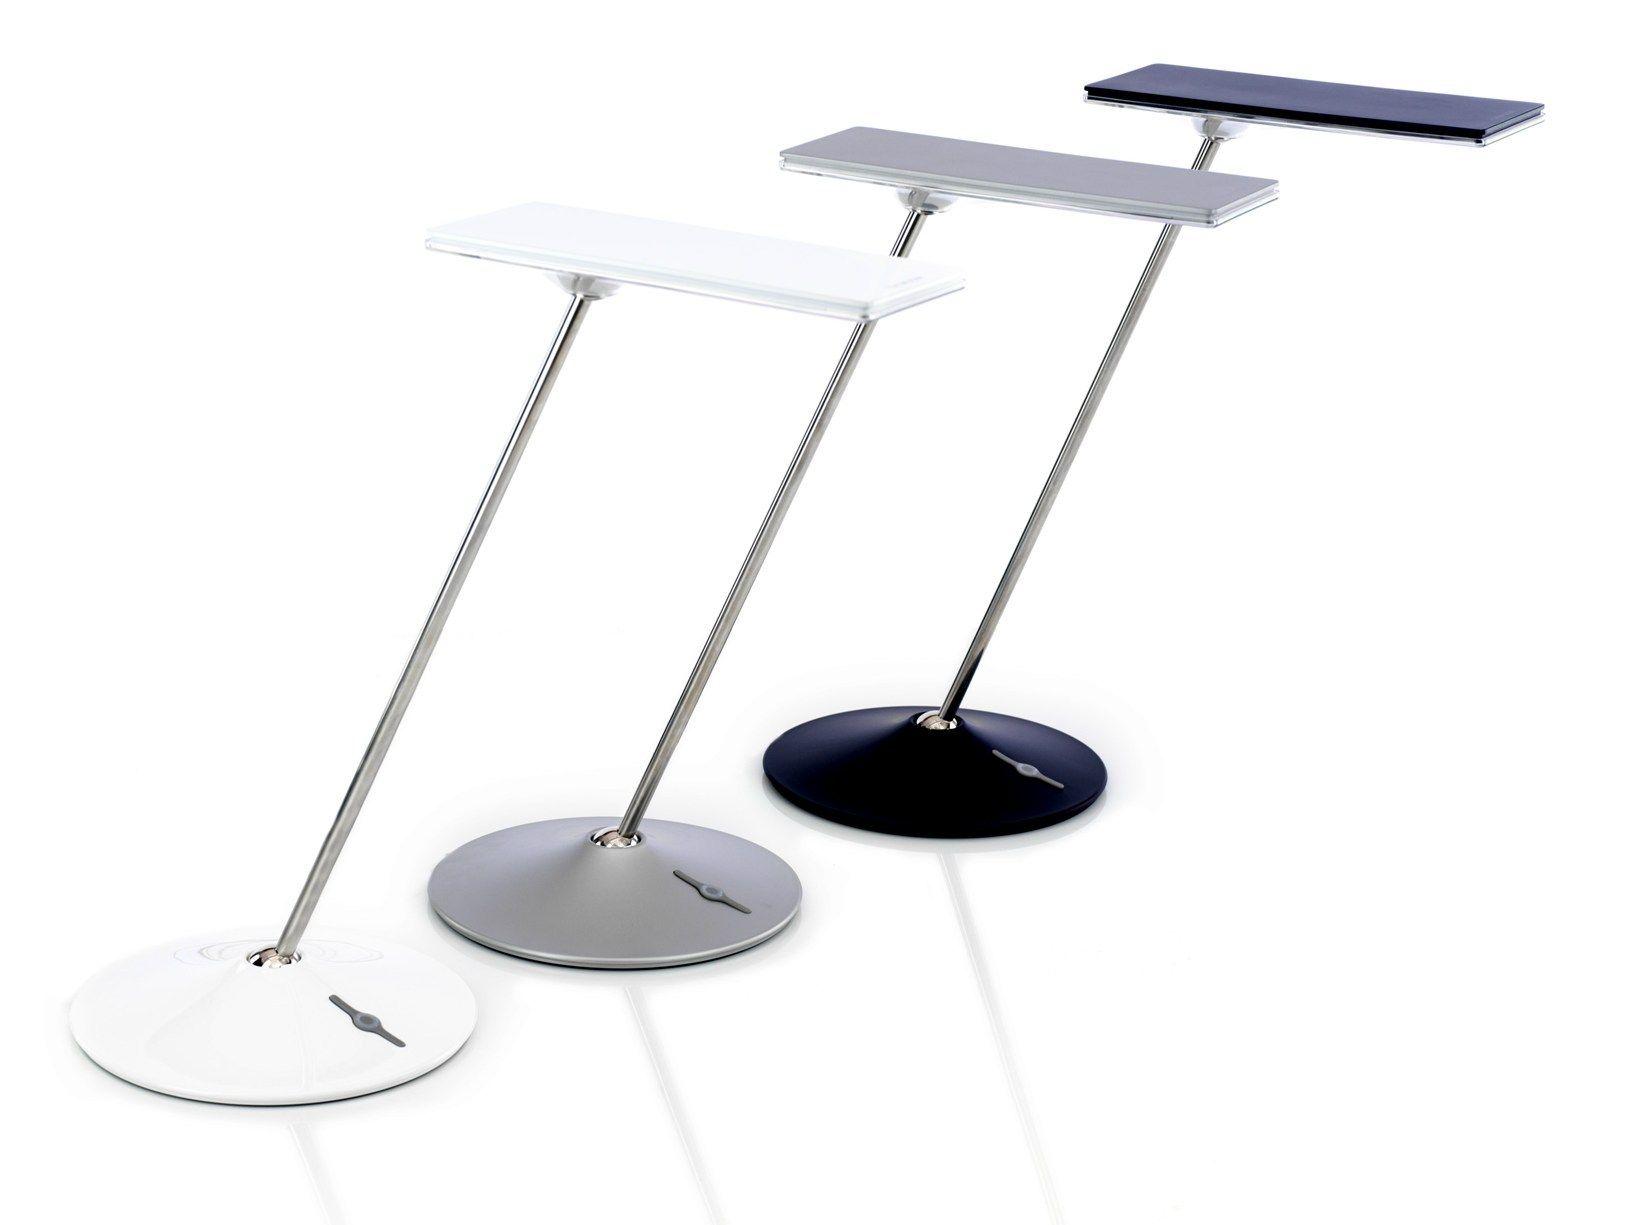 Humanscale To Showcase At Milan Furniture Fair